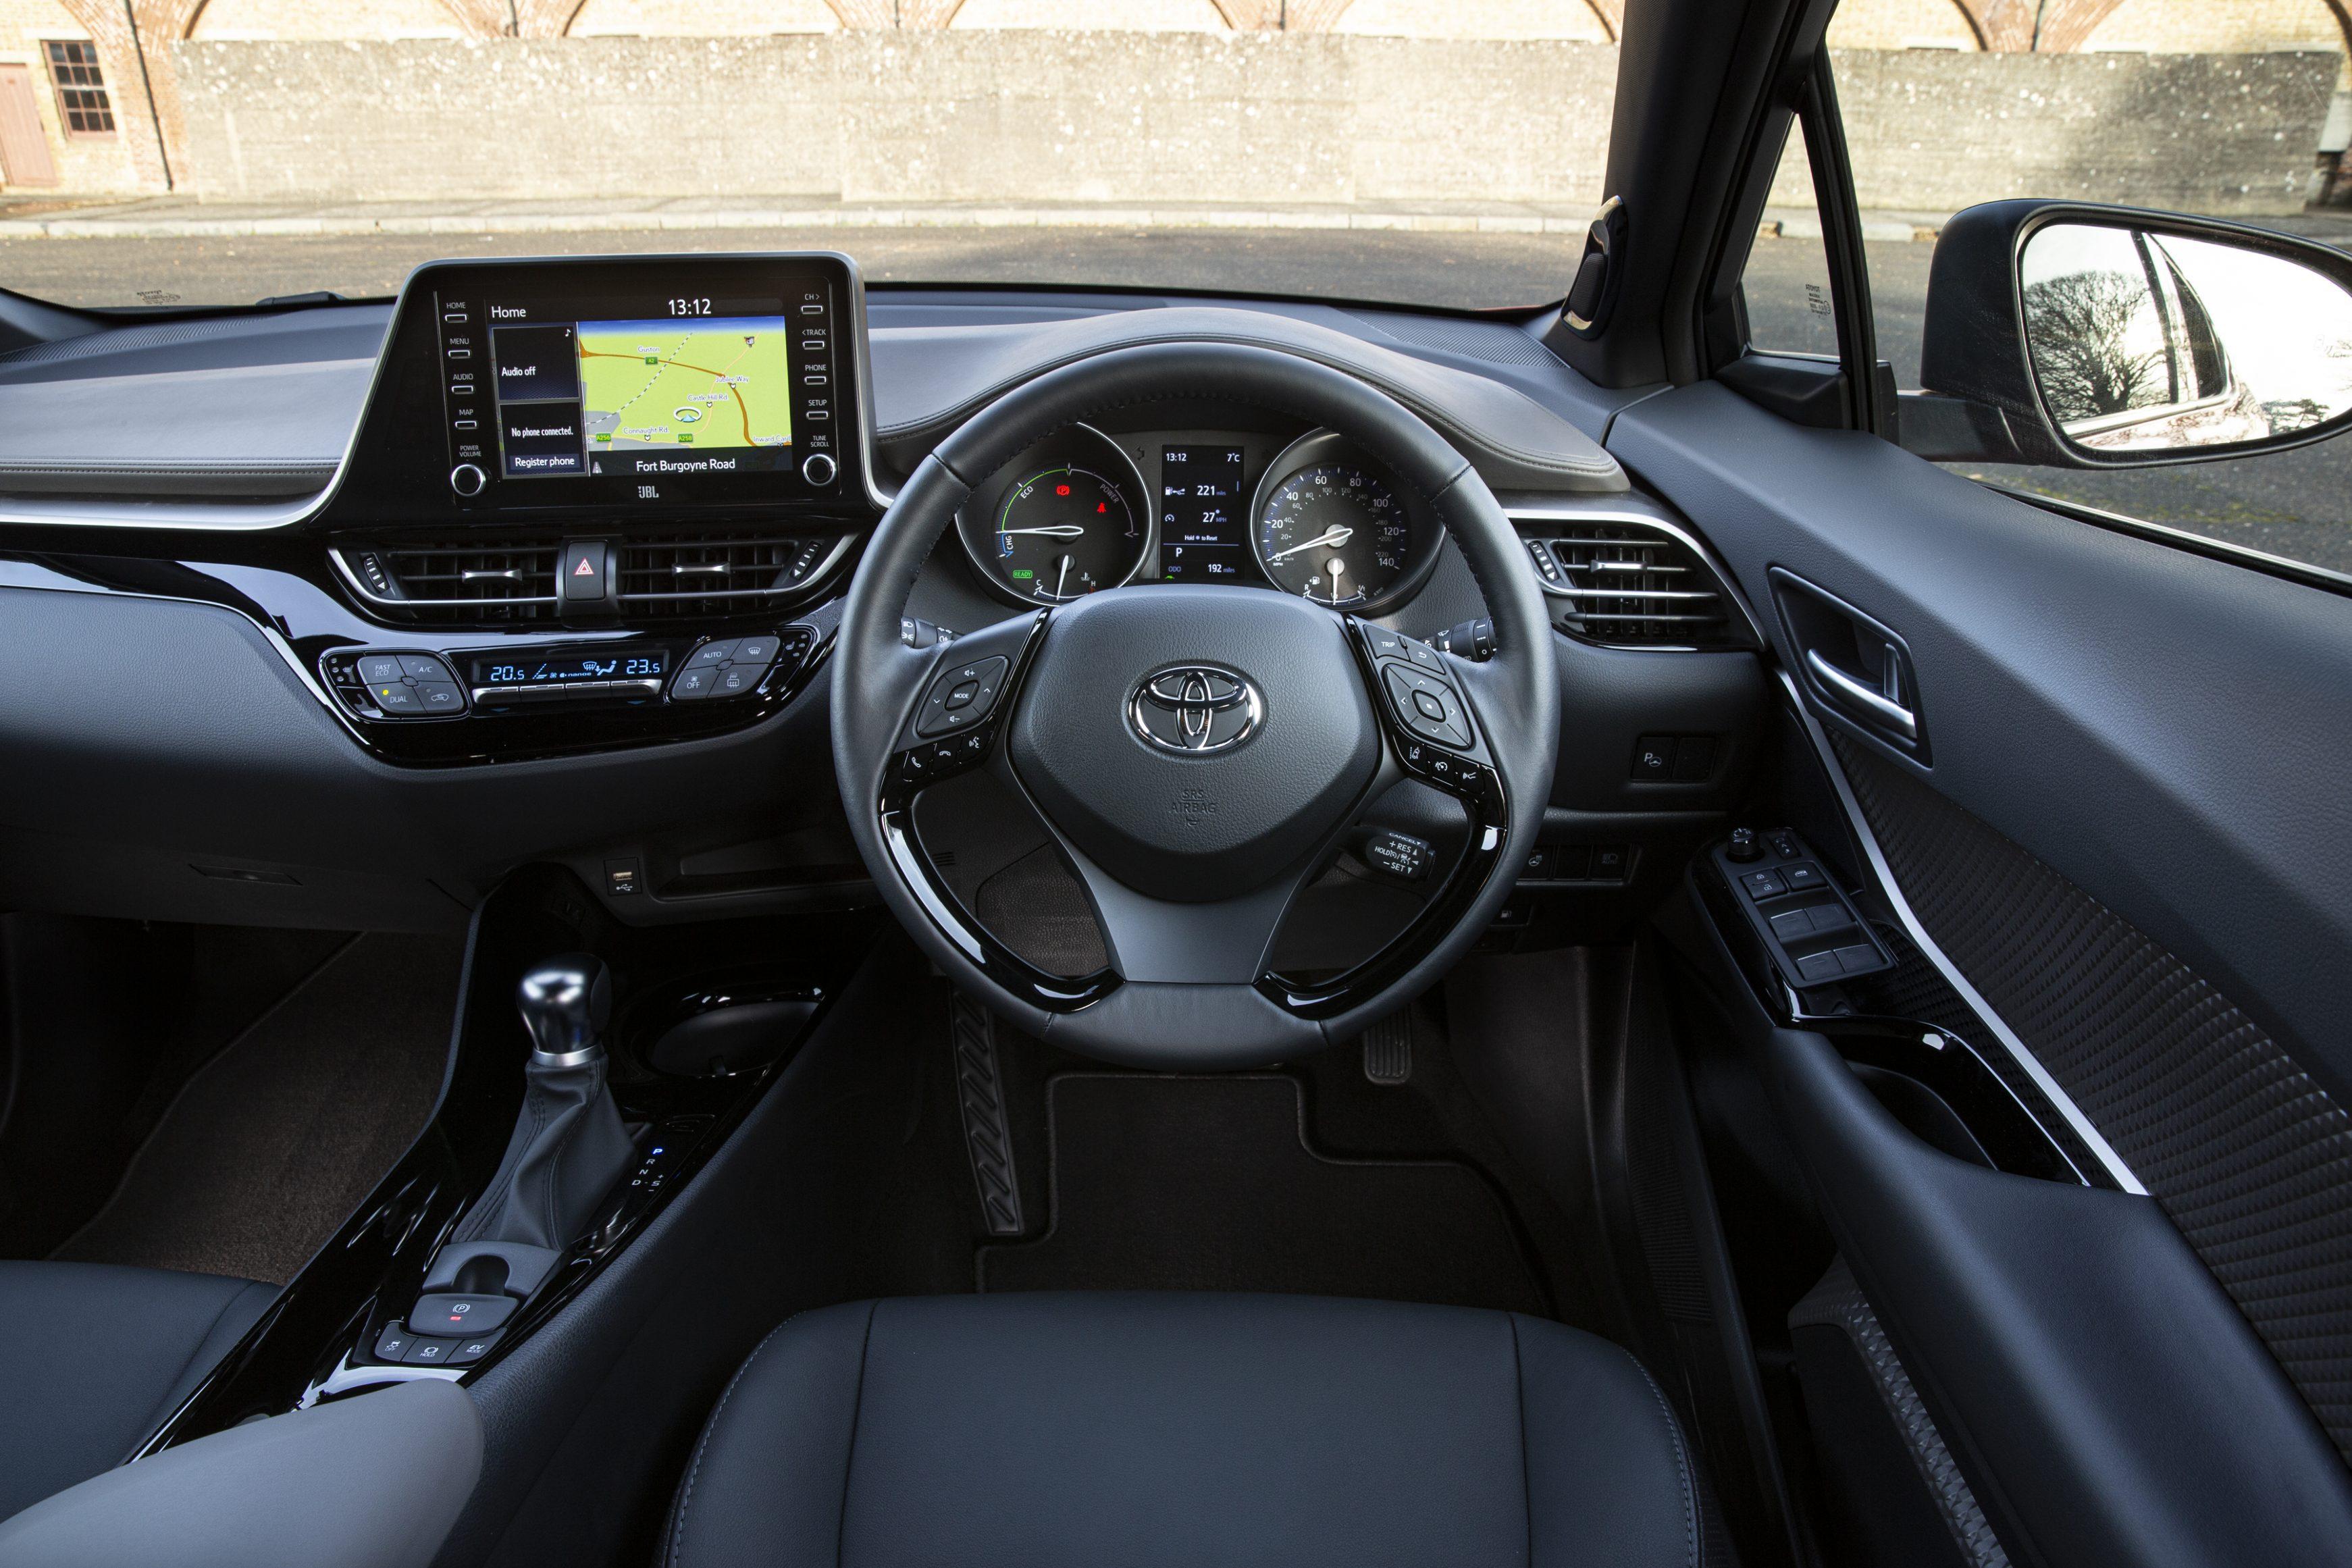 Toyota-C-HR driver's seat